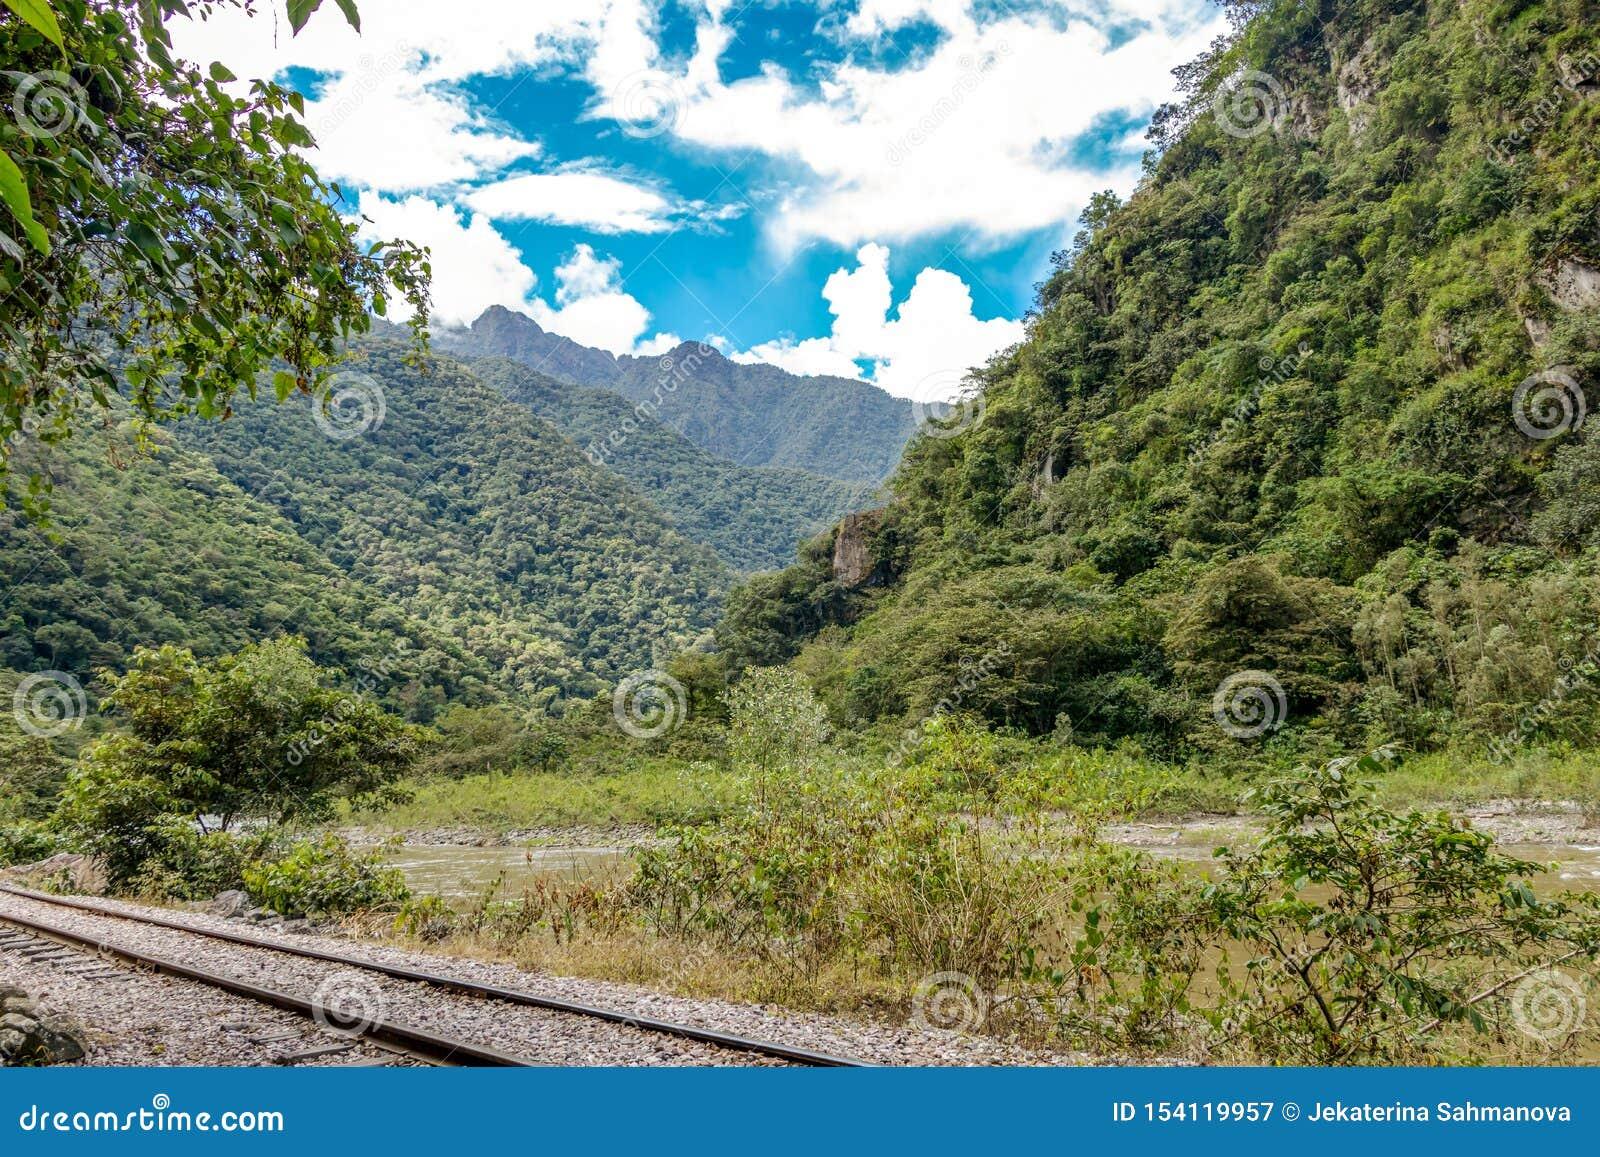 Railway to Machu Pichhu inca citadel and peruvian mountains at sunny day